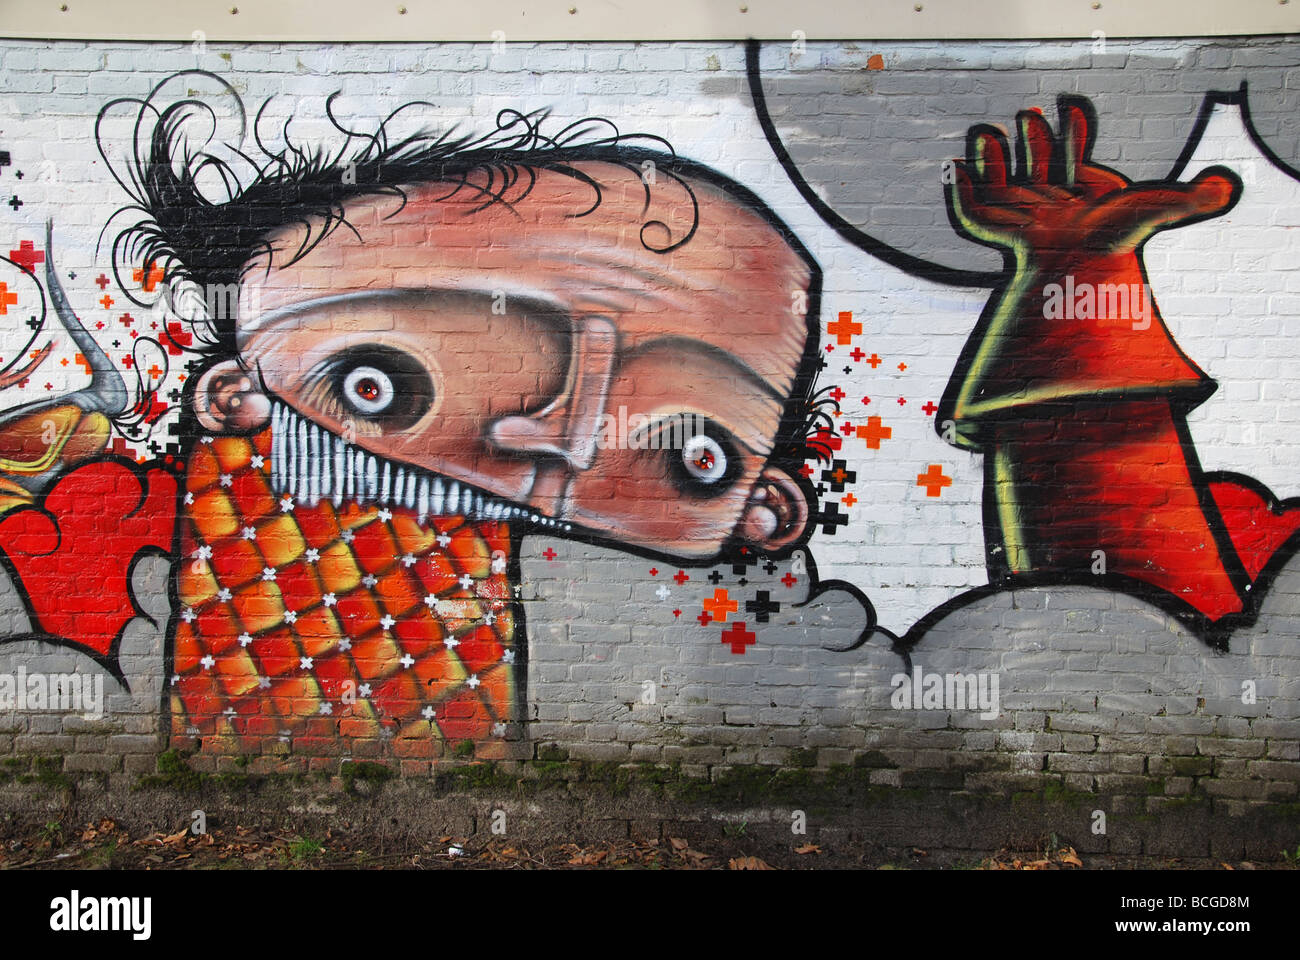 Graffiti, bedeckt, Wand Stockbild